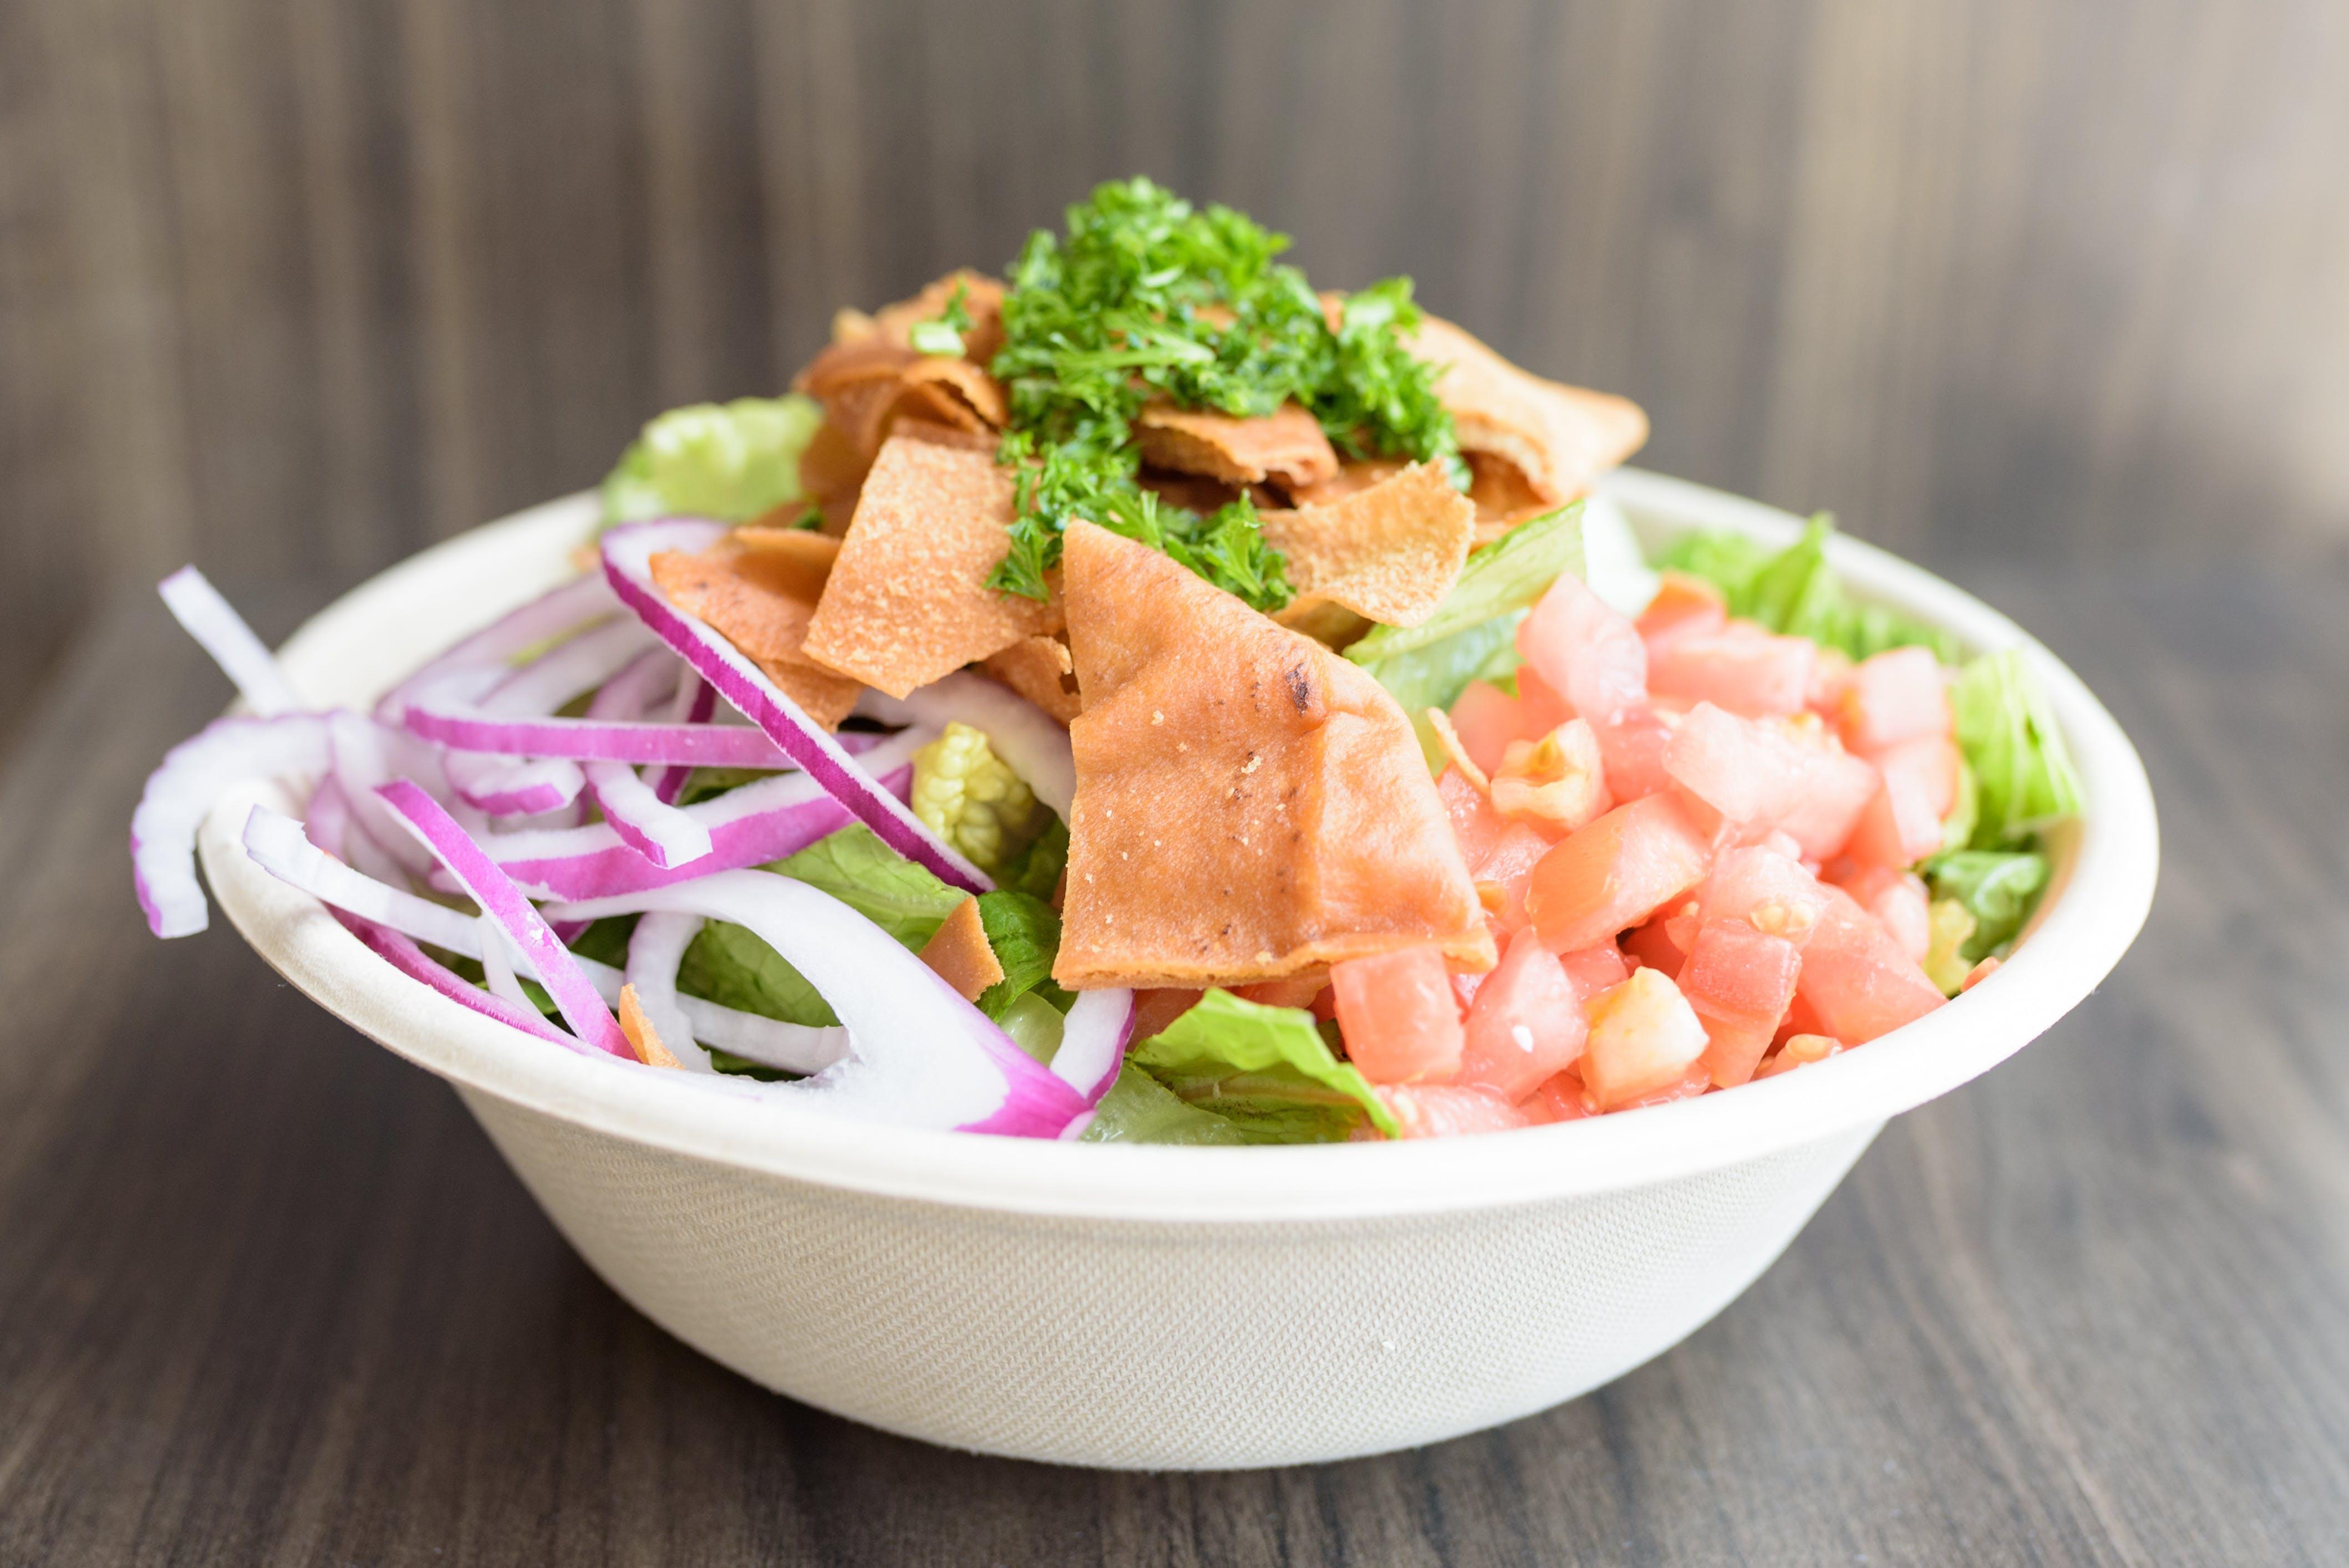 Fattoush Salad from Baba Dari Ann Arbor in Ann Arbor, MI